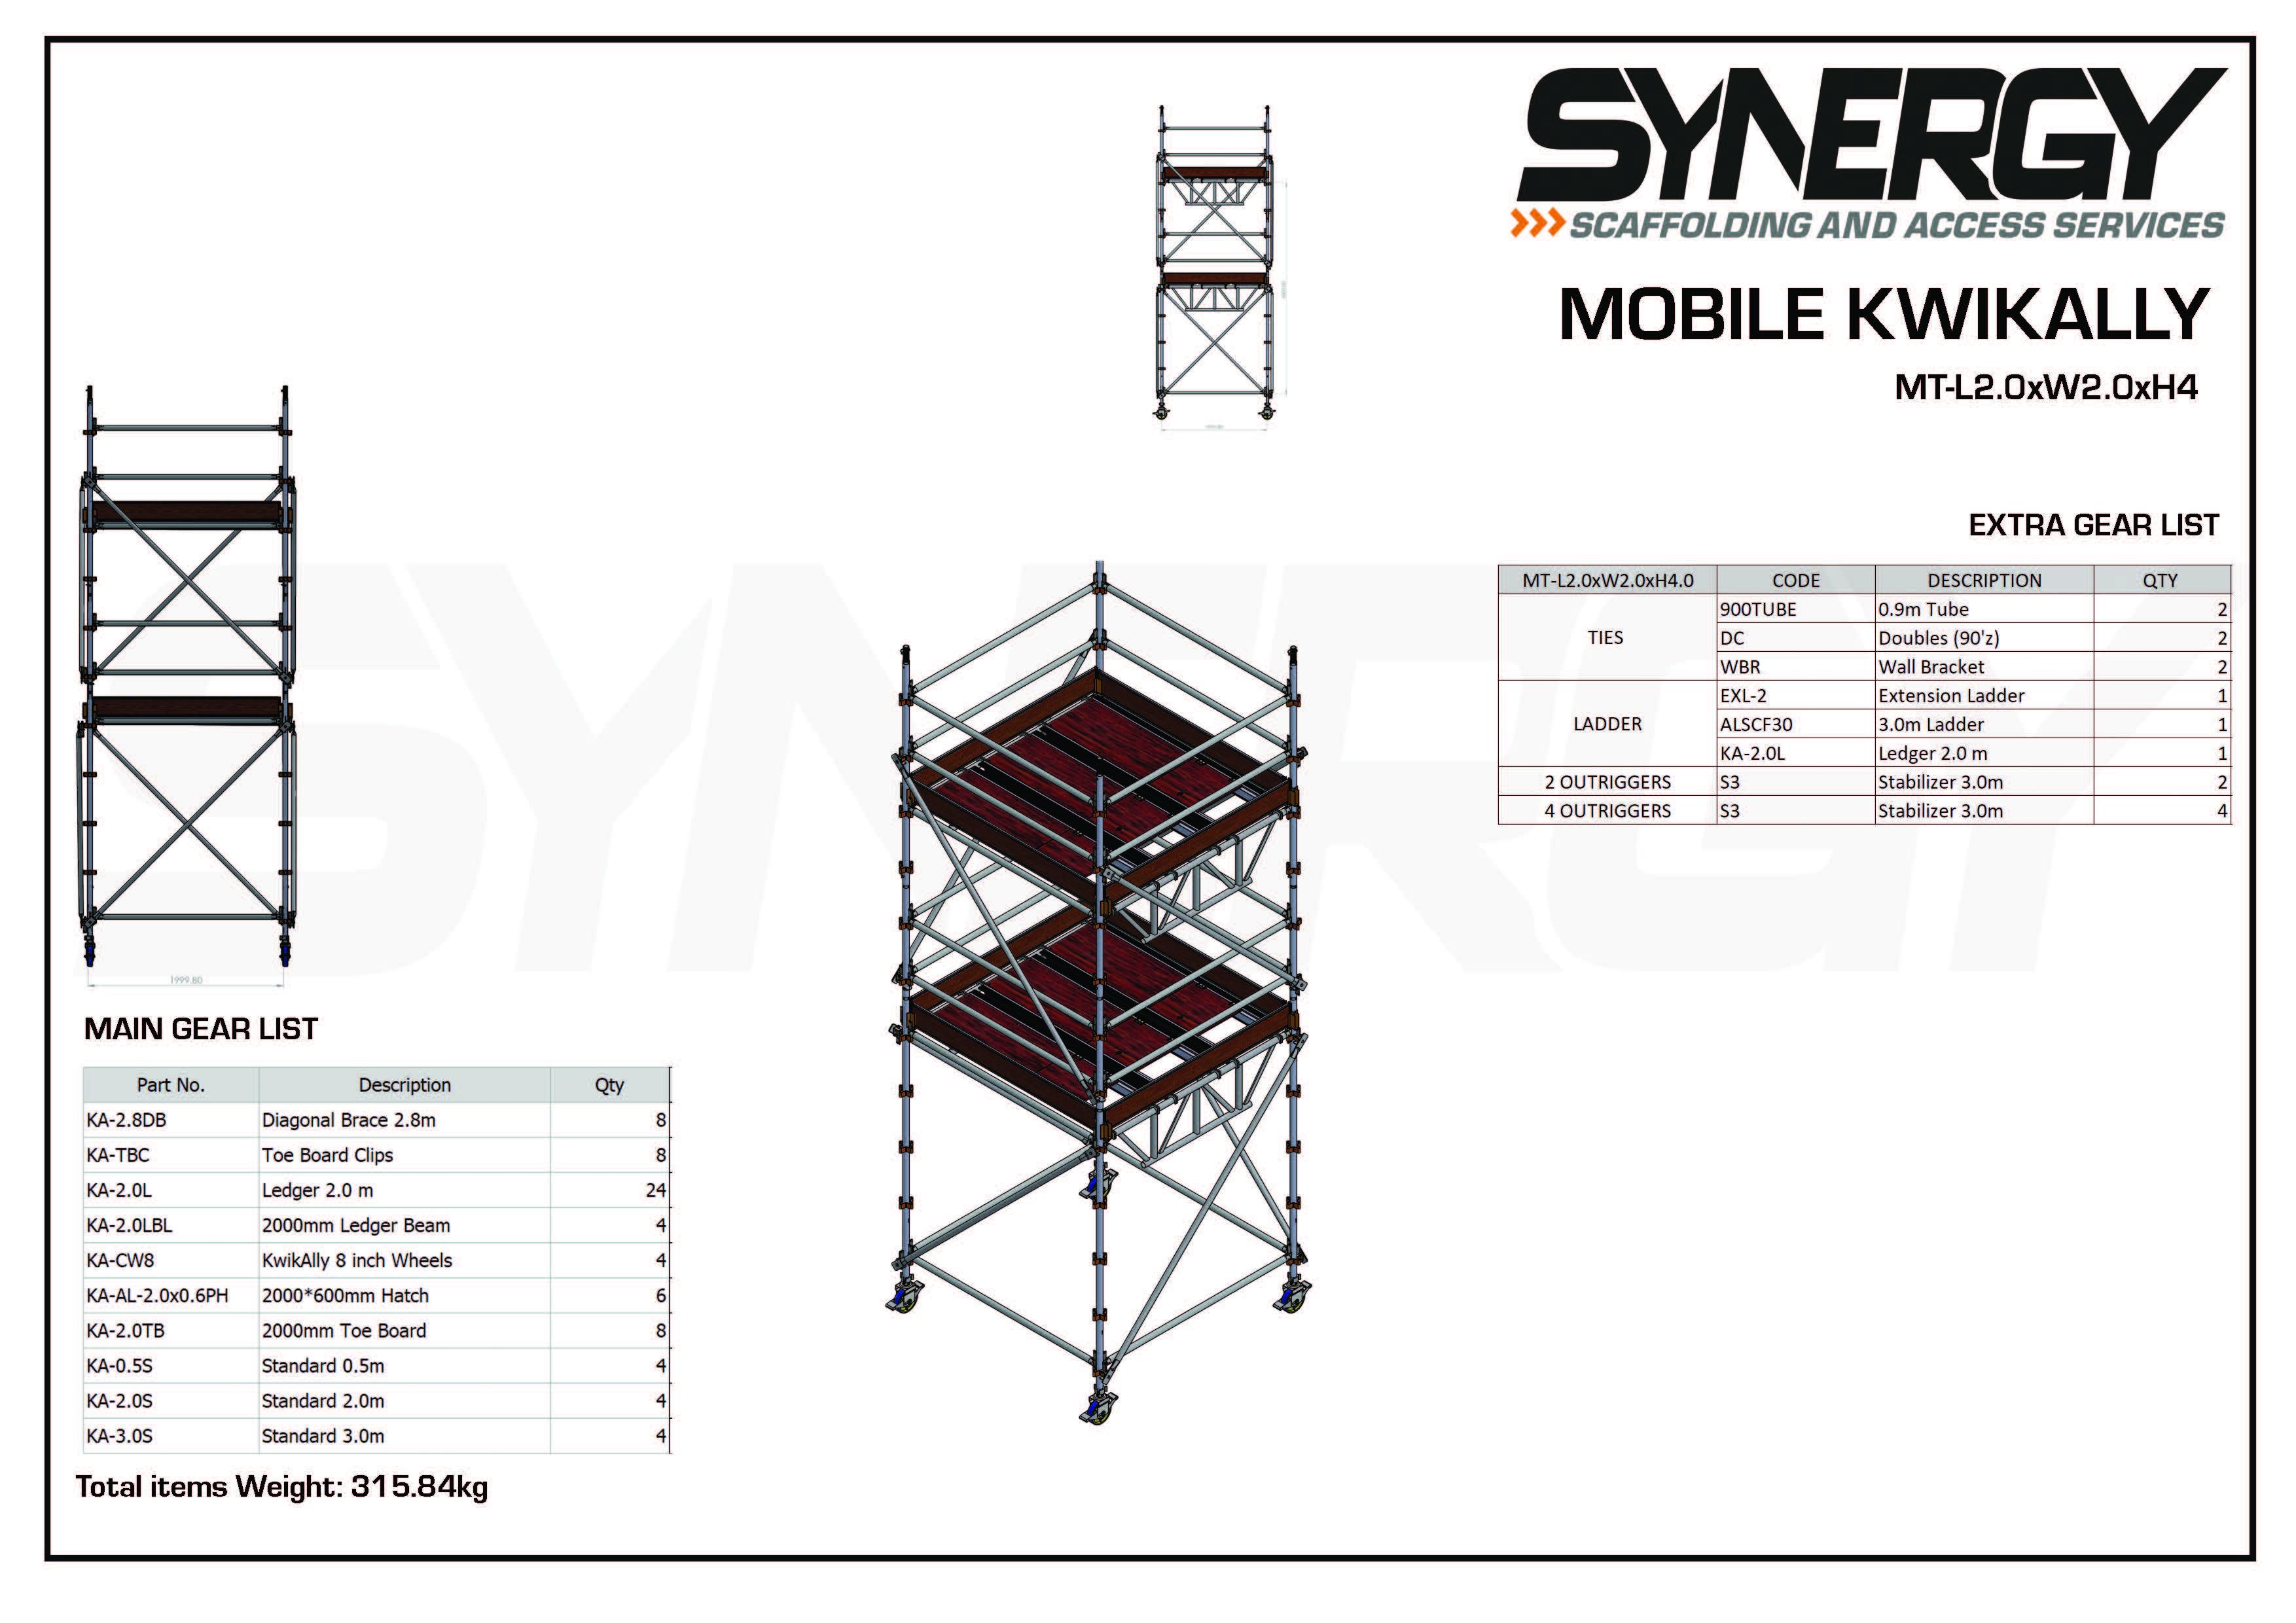 Kwikally Mobile 2.0m x 2.0m x 4m(Height)